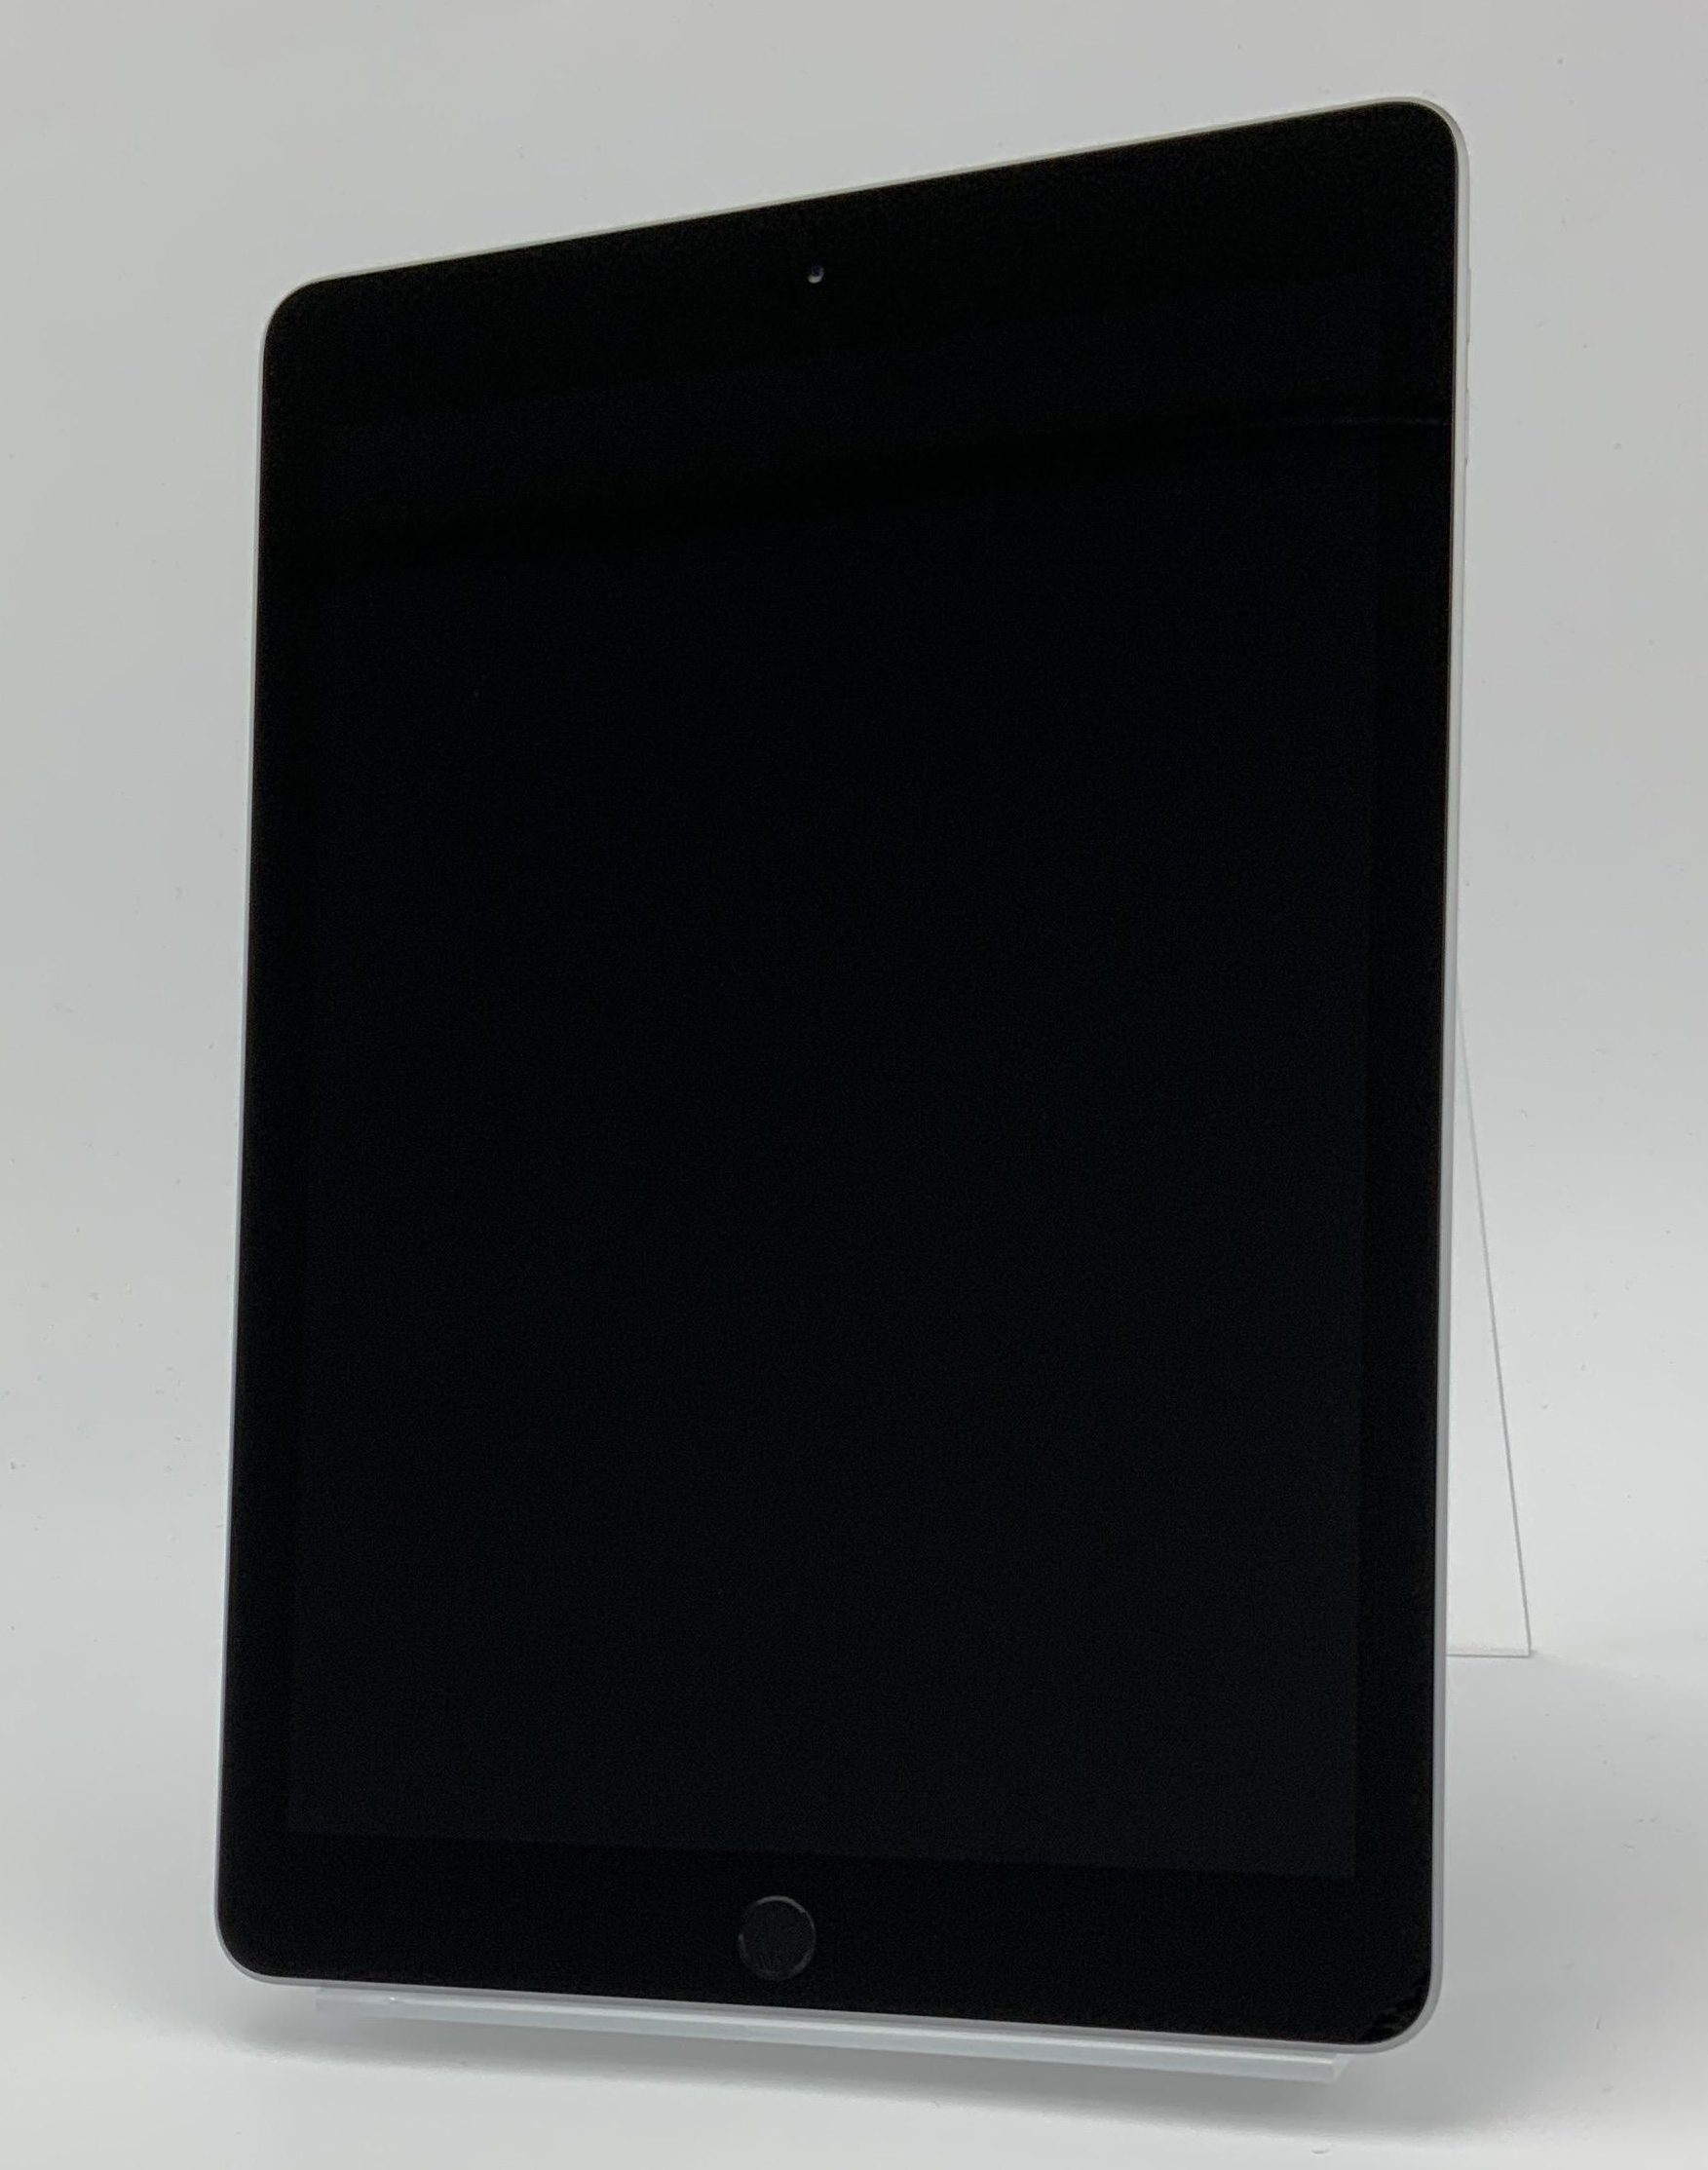 iPad 6 Wi-Fi 32GB, 32GB, Space Gray, Bild 1